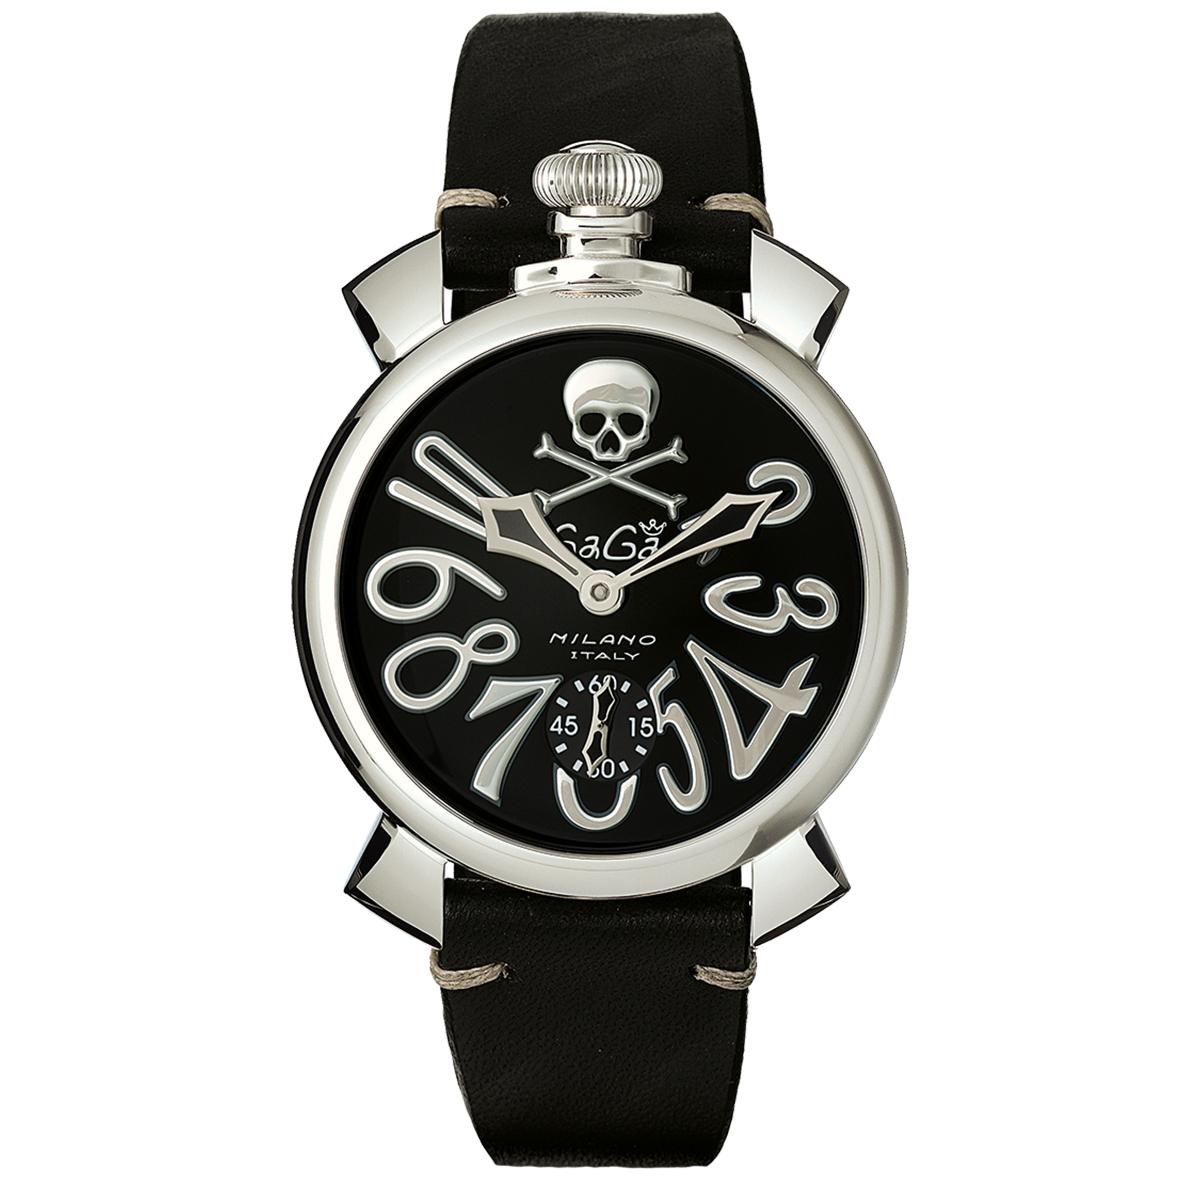 GAGA MILANO ガガ ミラノ 5010-ART-2S MANUALE  マヌアーレ ユニセックス 時計 腕時計[あす楽]